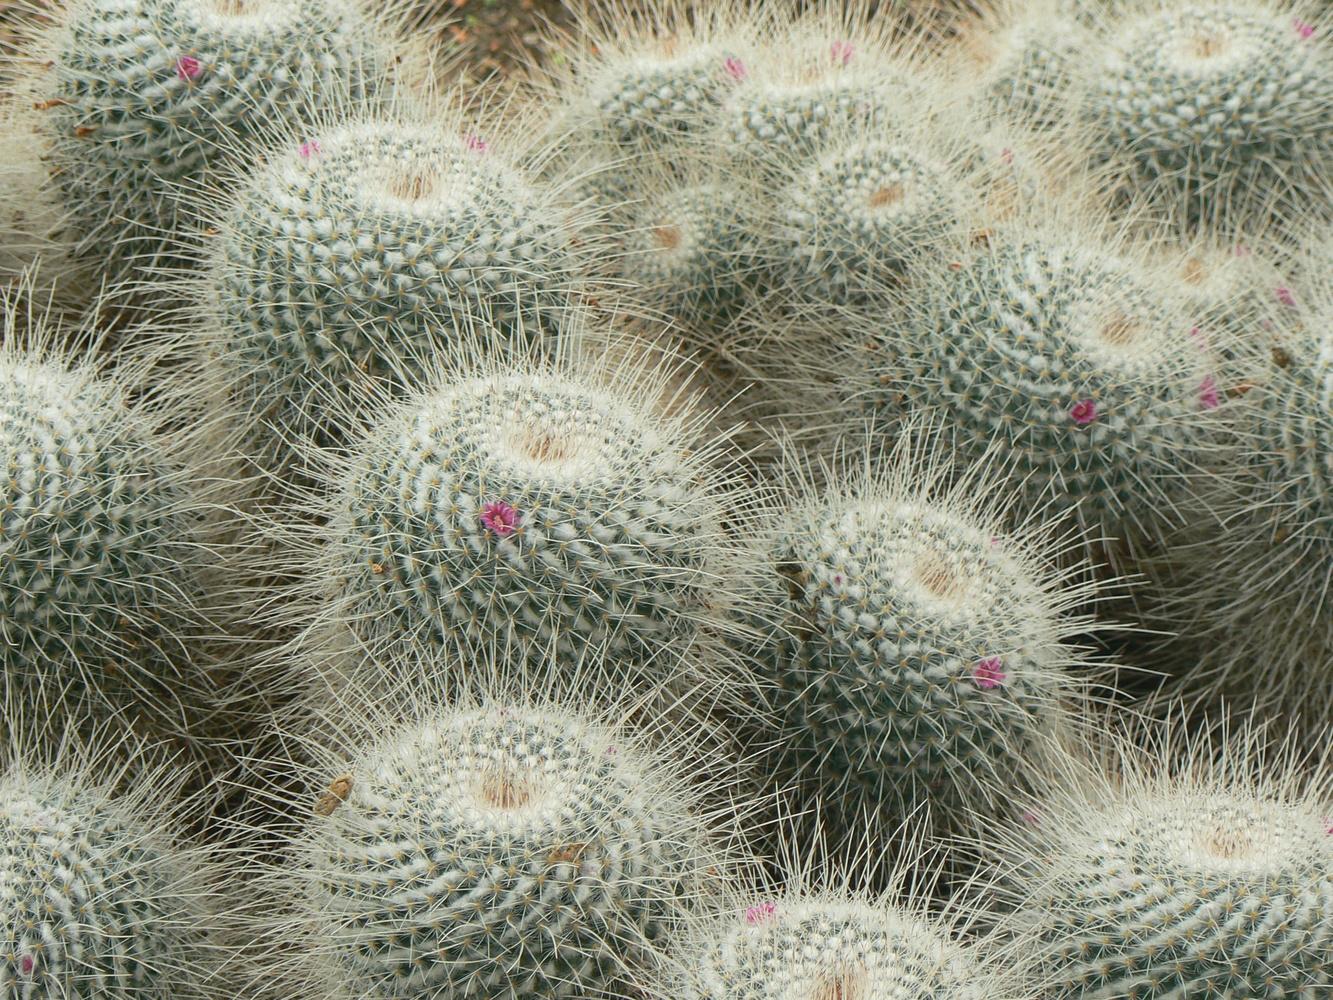 Cactus by Paul Hammond